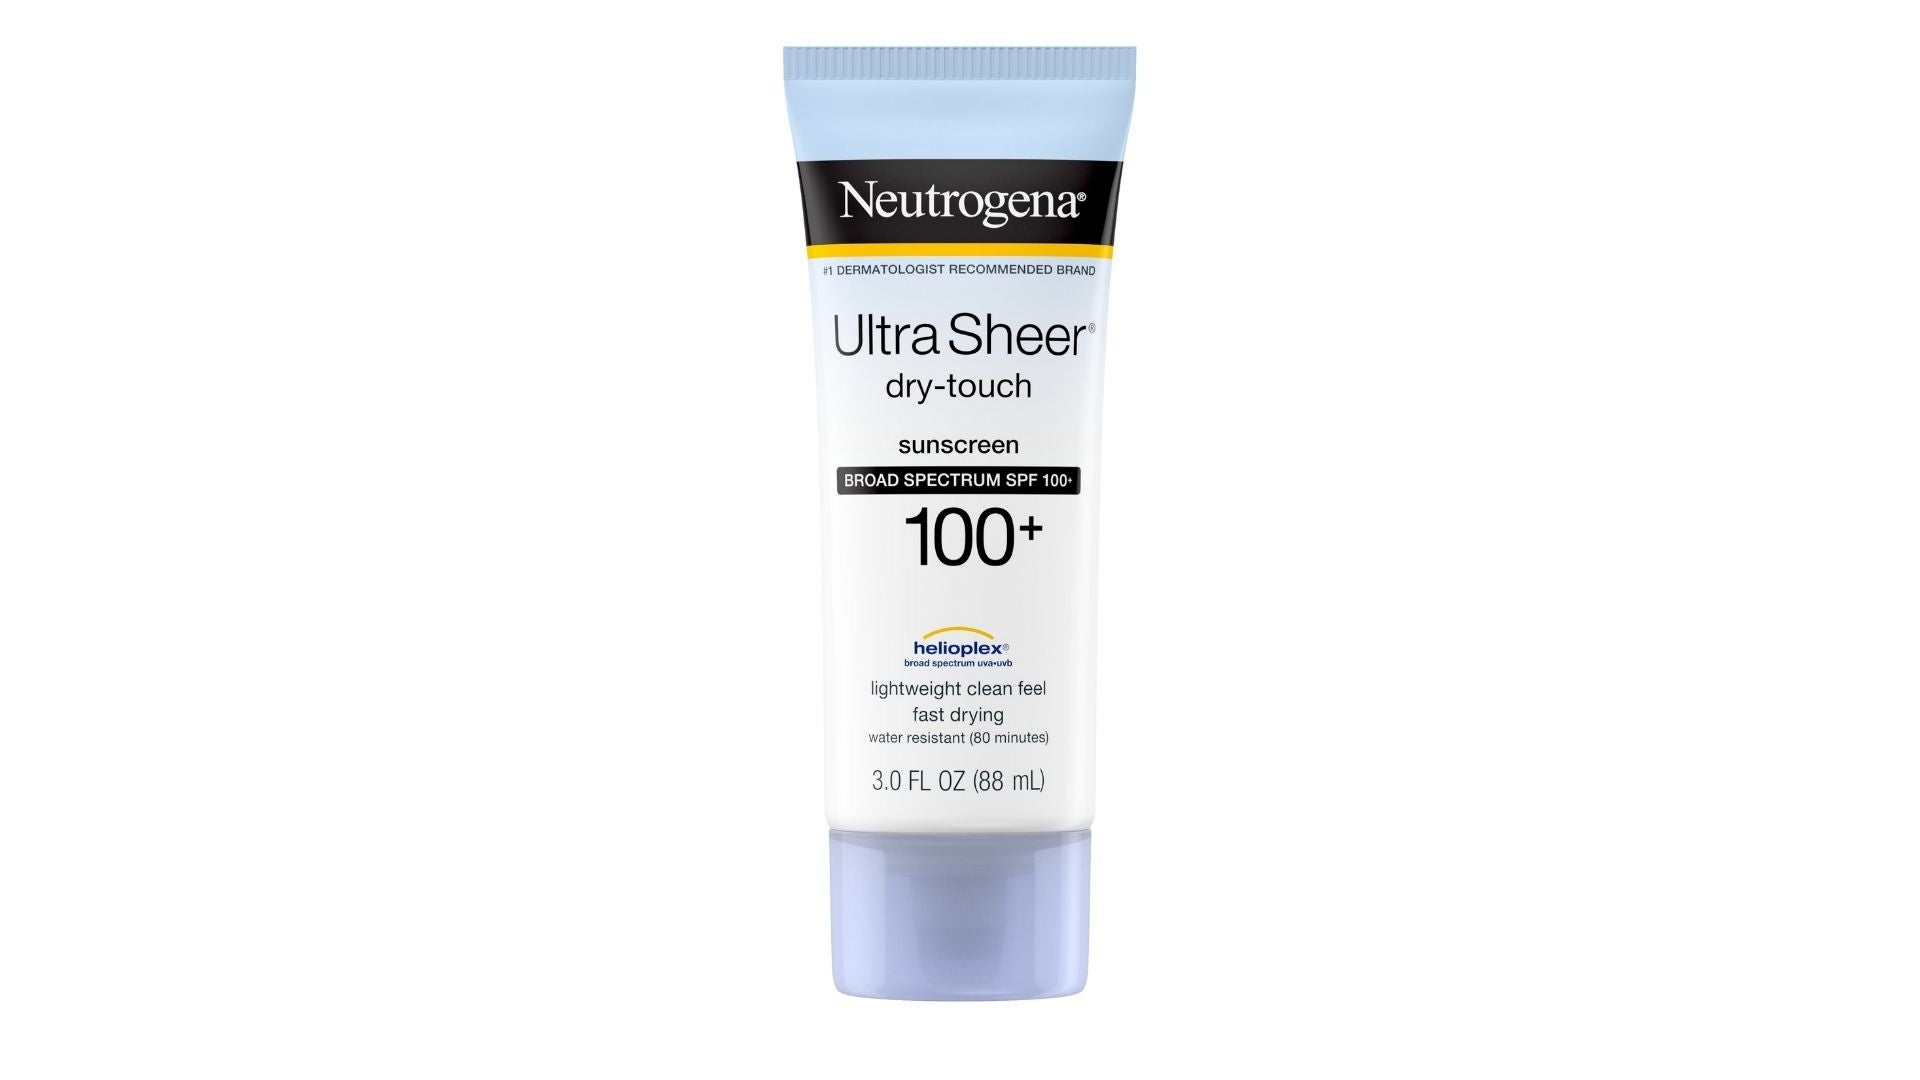 Neutrogena Ultra Sheer Dry-Touch SPF 100 Sunscreen, 3 oz